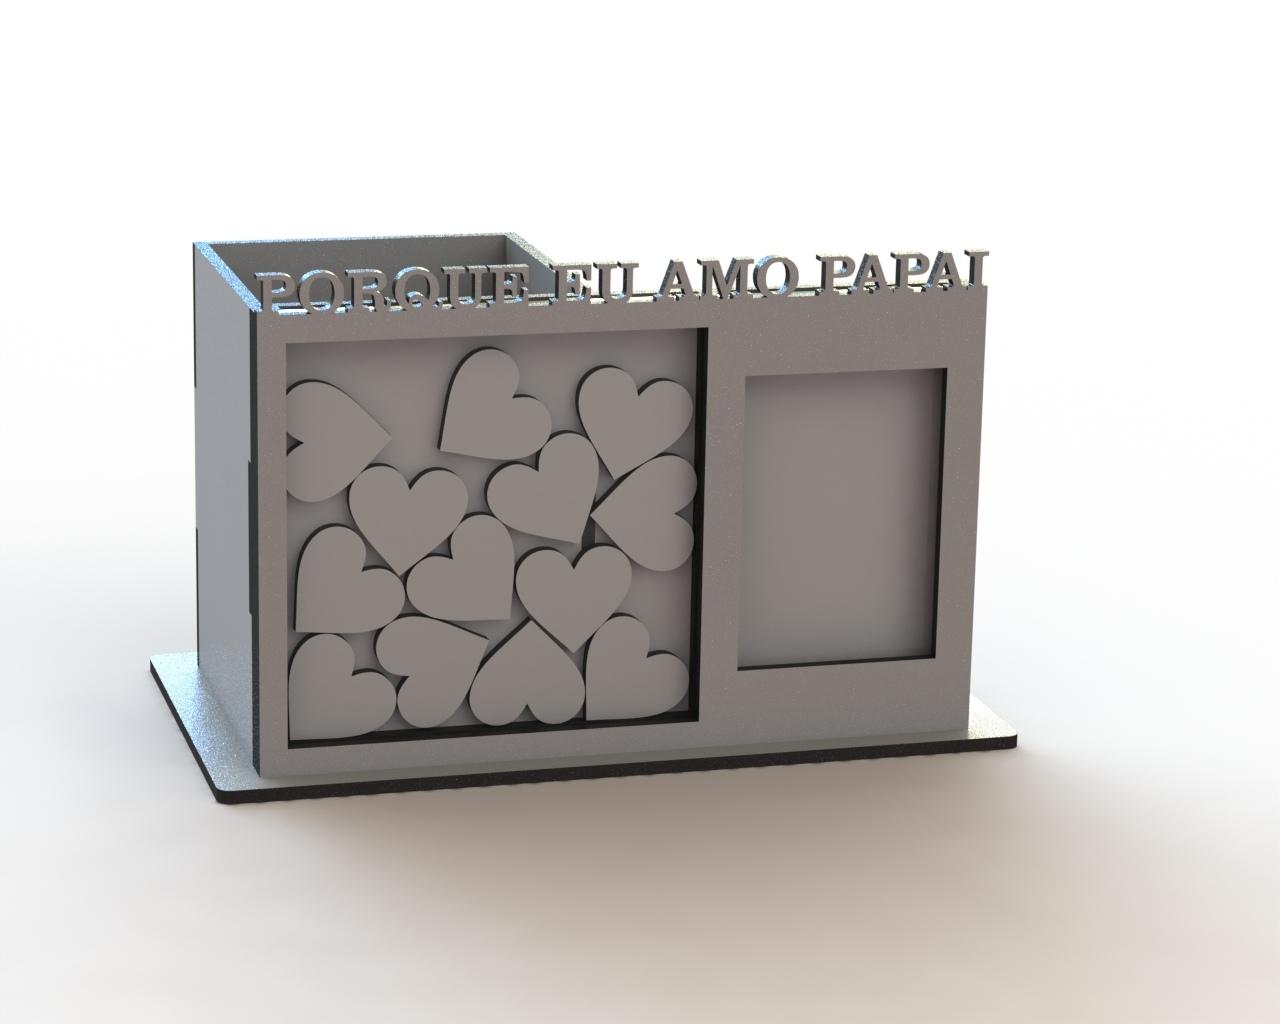 Laser Cut Pen Holder Organizer With Photo Frame Wish Box Free Vector